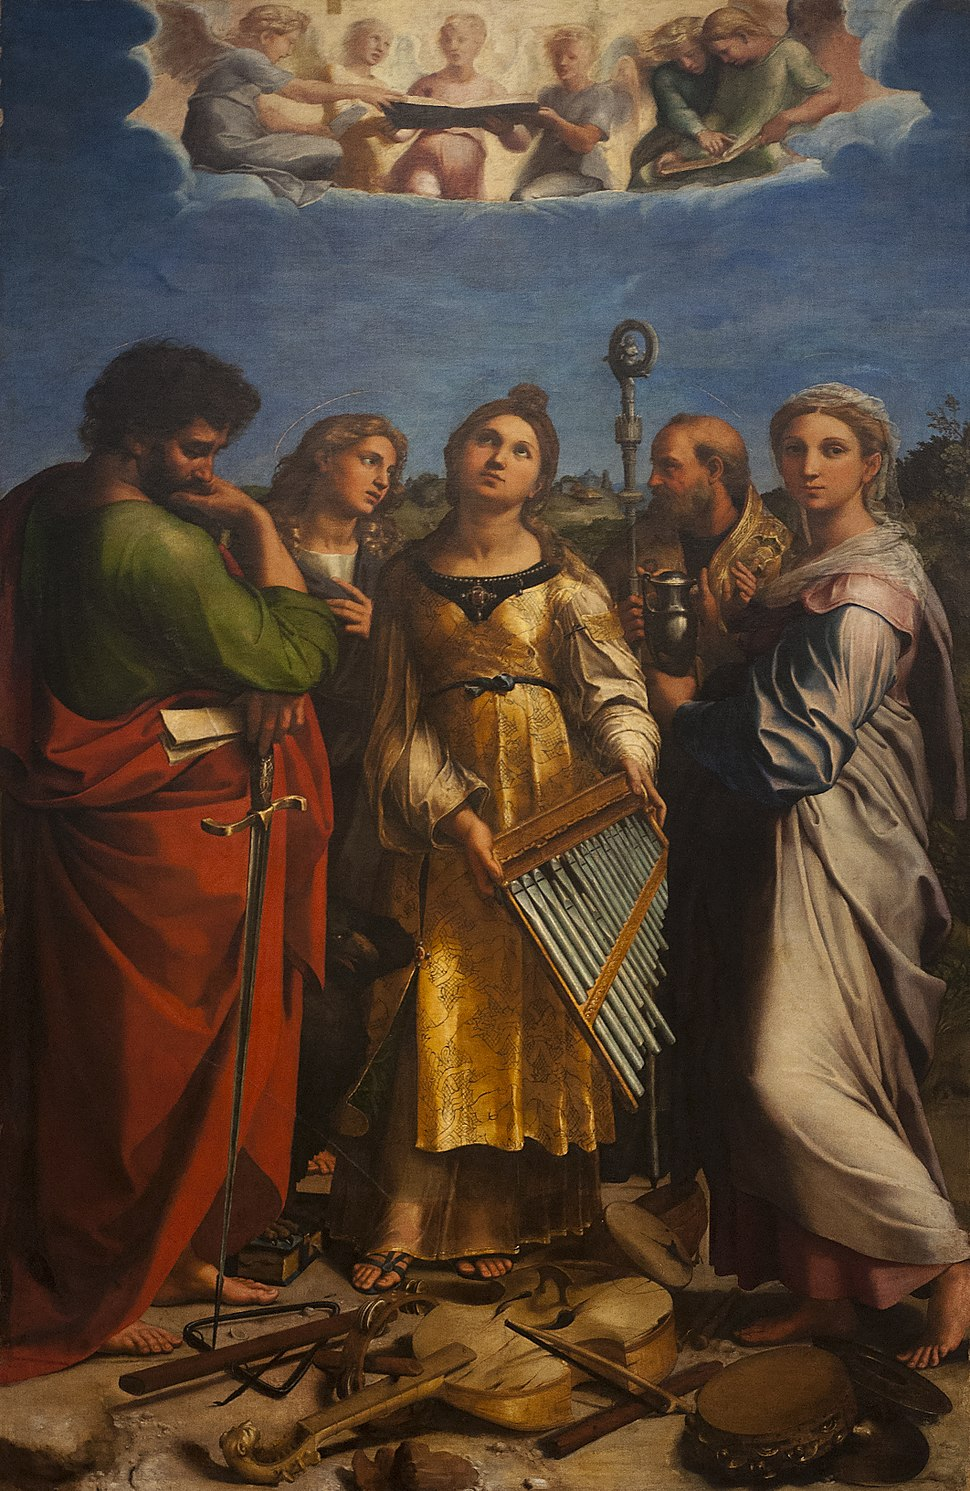 Bologna Pinacoteca Nazionale - Rafaël Santi (1483-1520) - Heilige Cecilia in extase met Paulus, Johannes (evangelist), Augustinus en Maria Magdalena - 26-04-2012 9-13-18